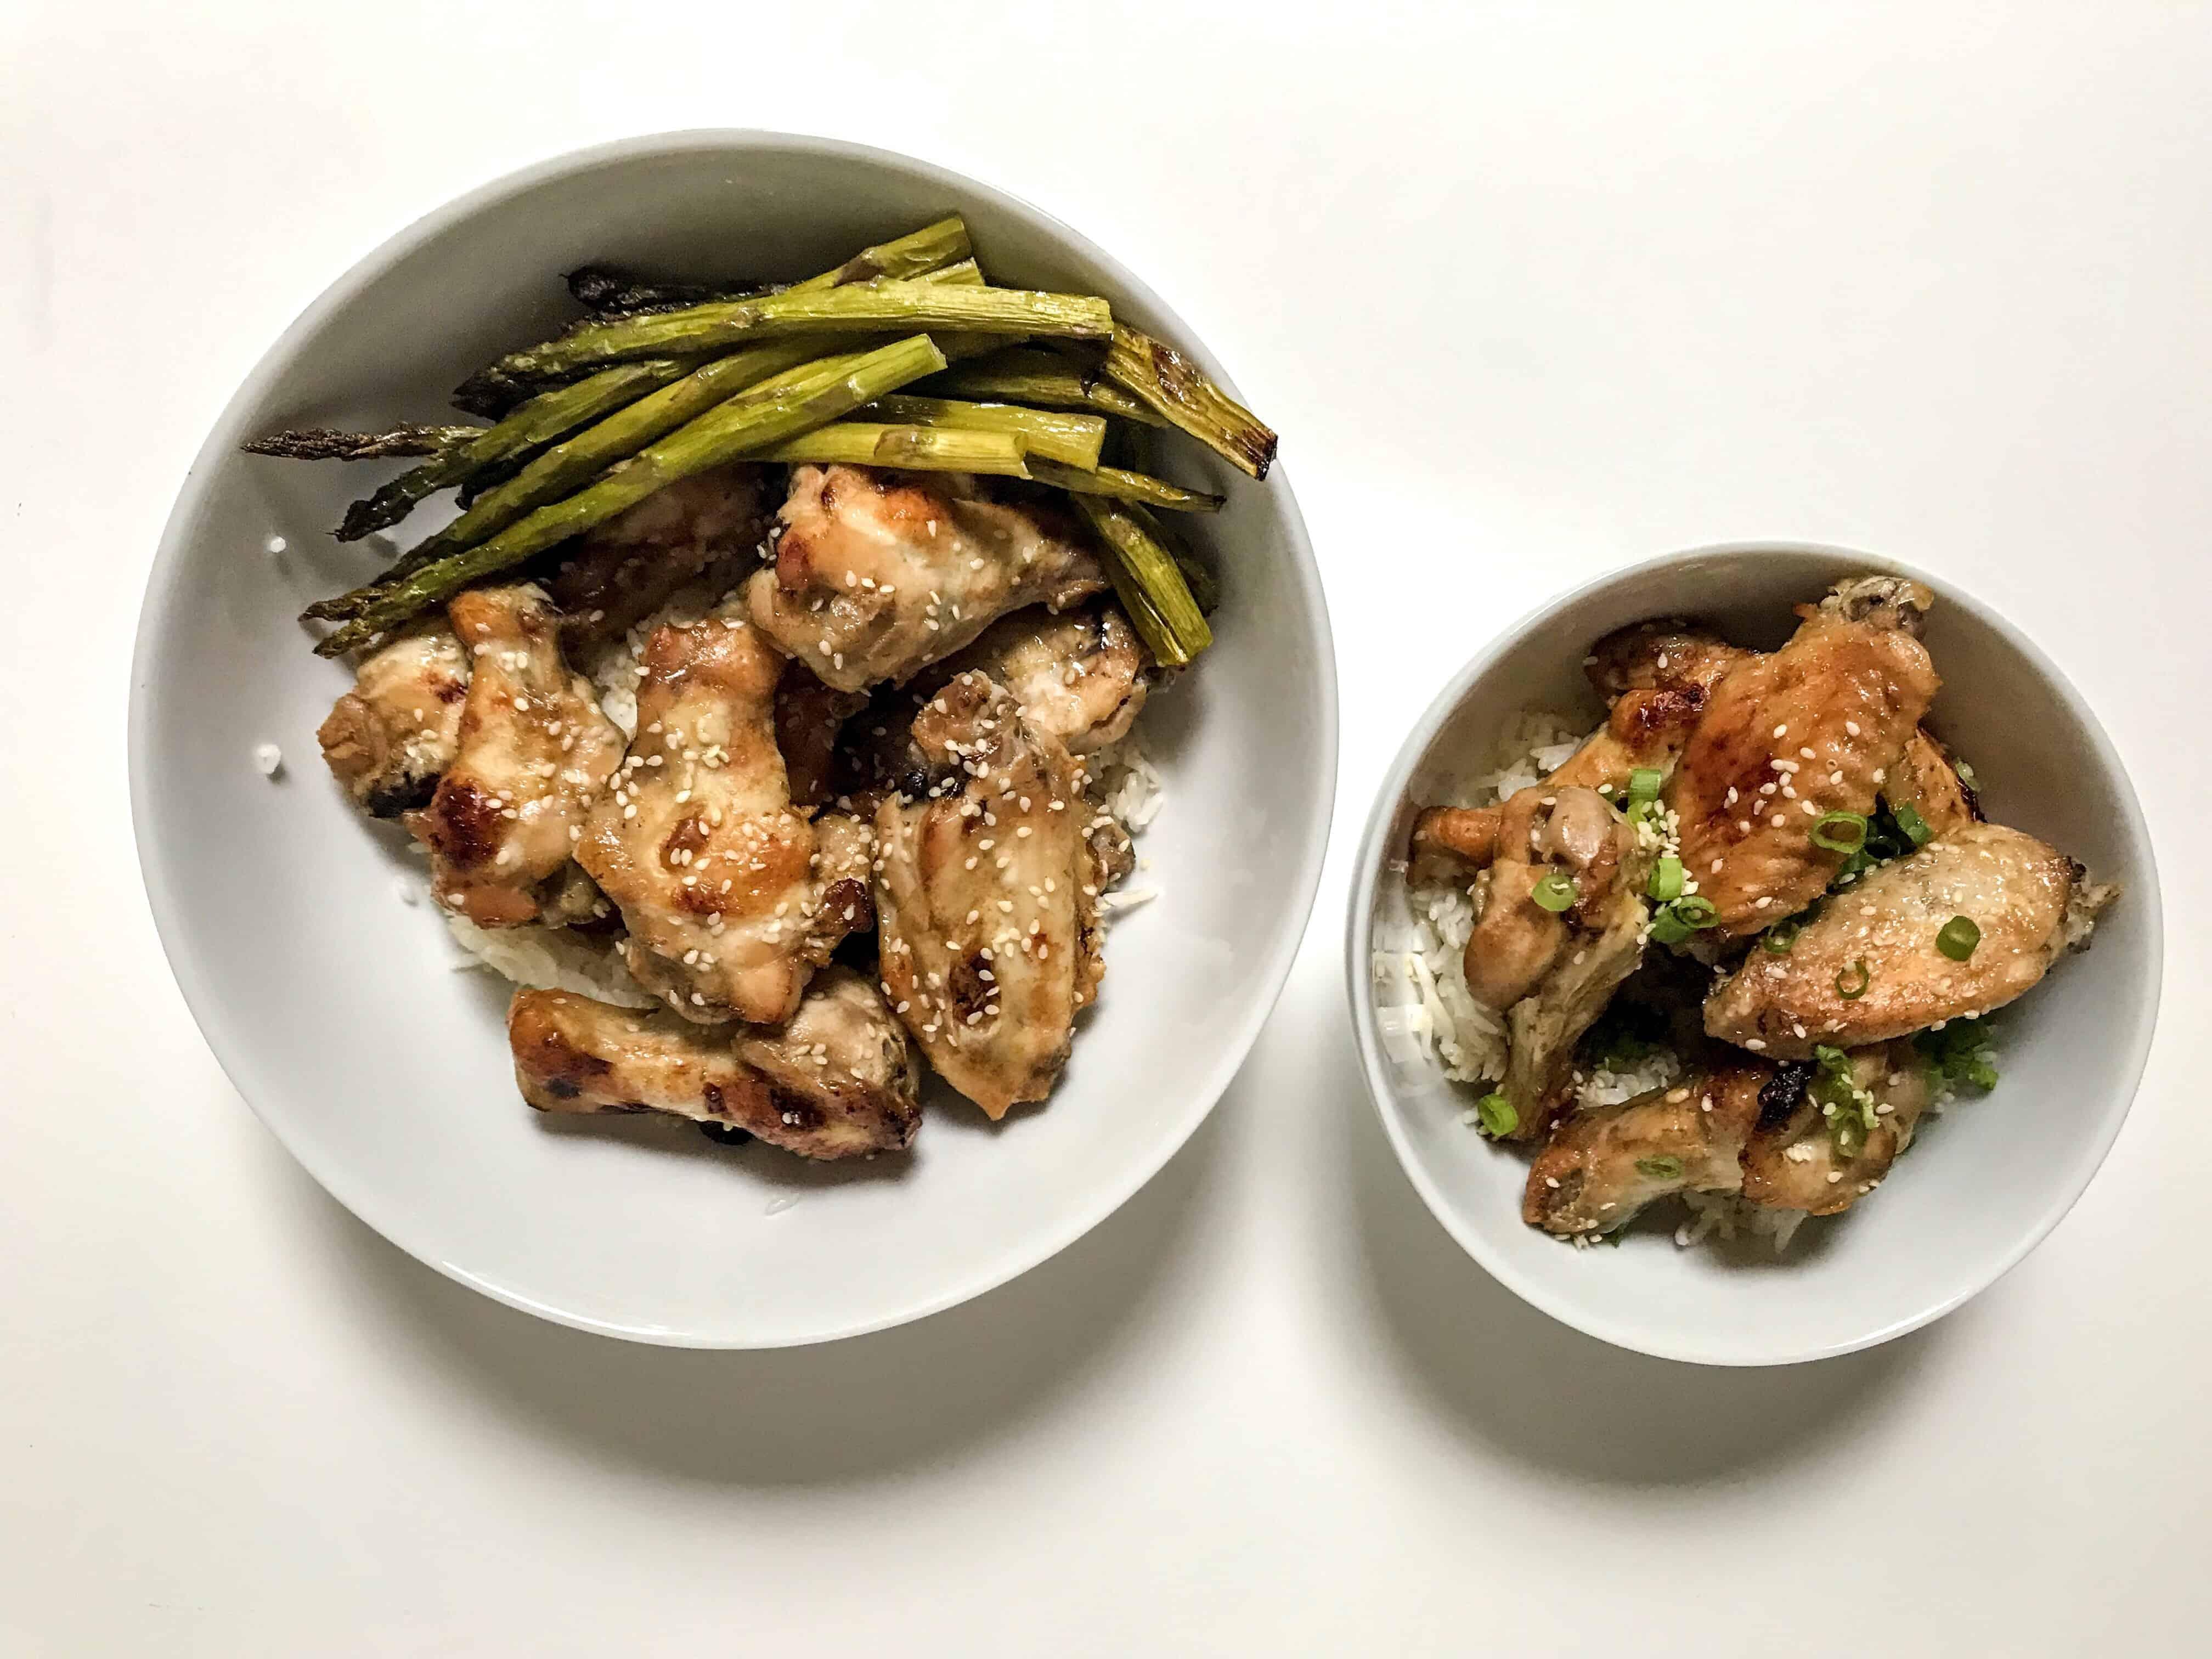 chicken wings dunzo